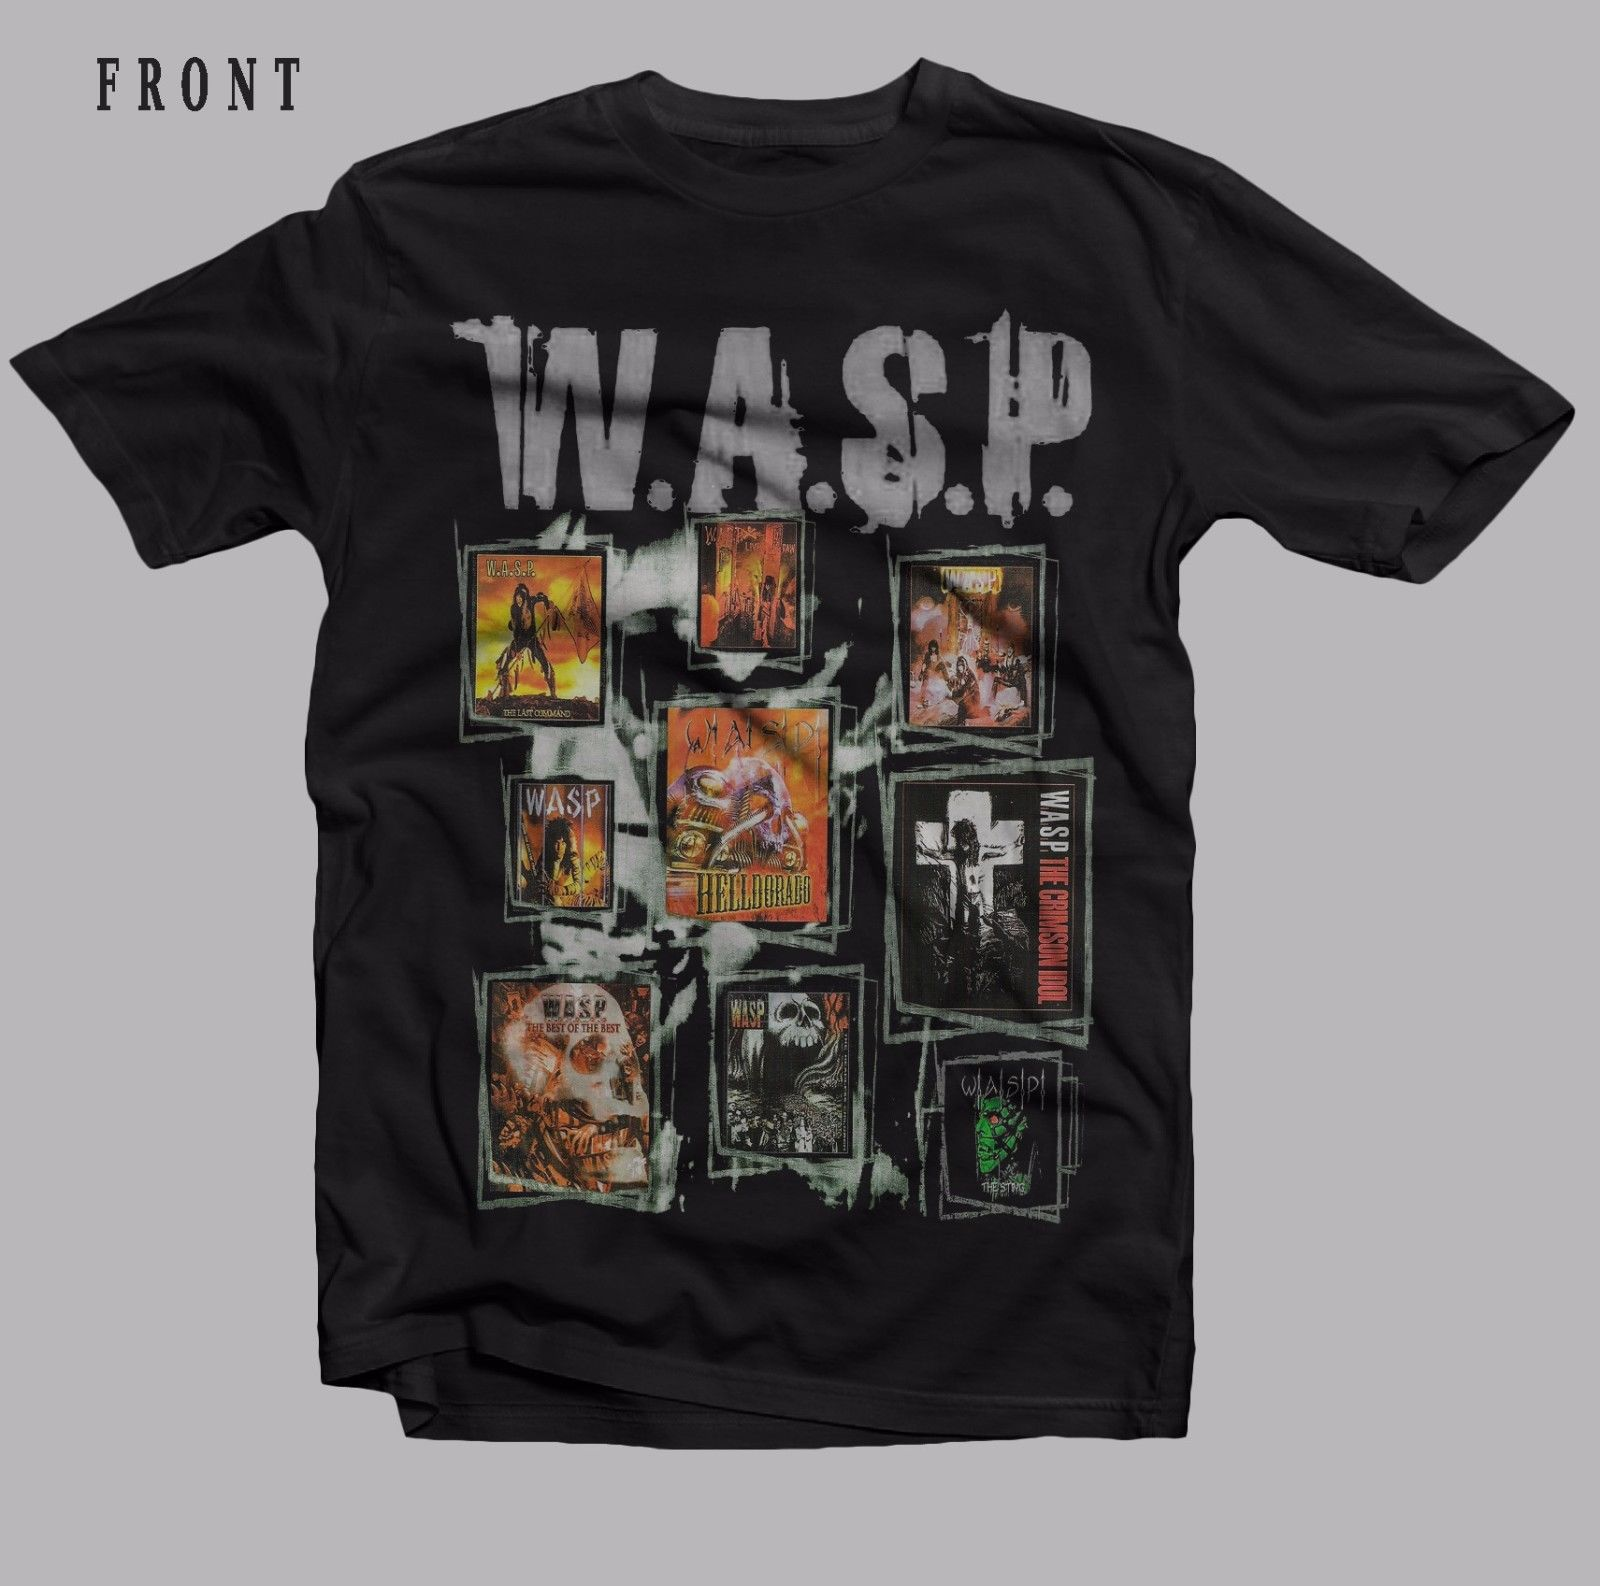 W.A.S.P.-American heavy metal band-Judas Priest ,T-shirt-SIZES: S to 7XL